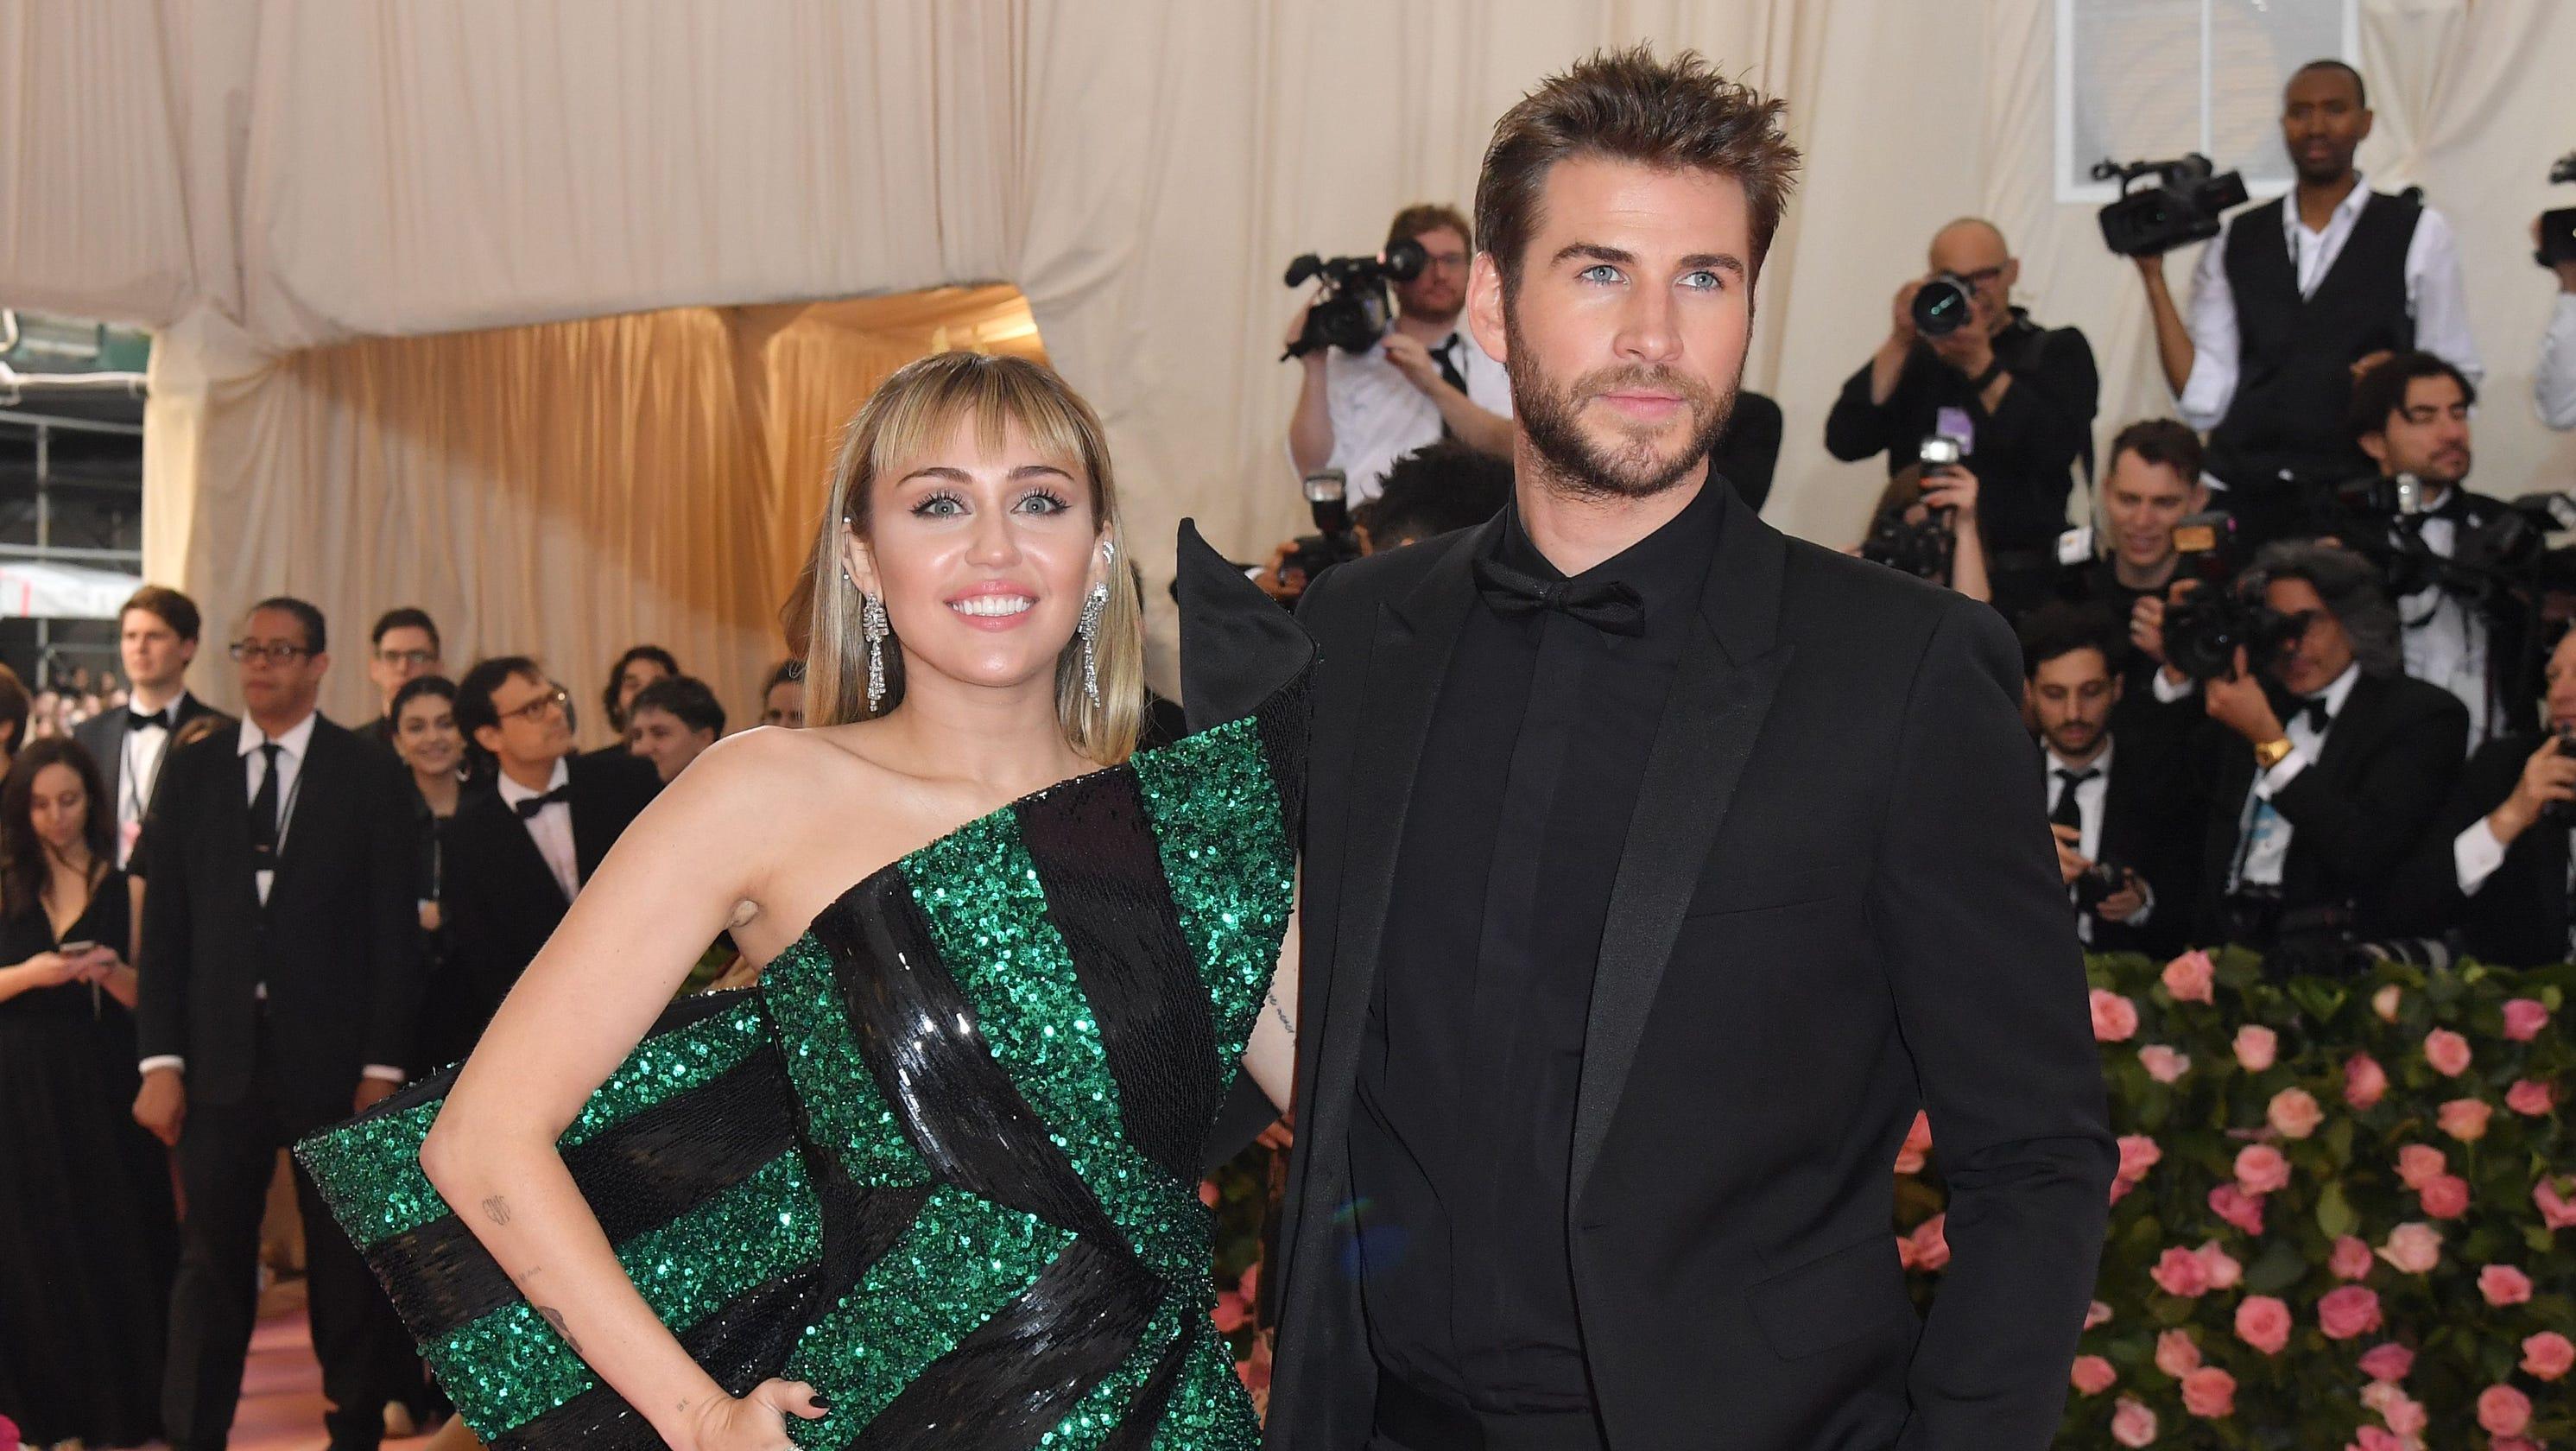 Miley Cyrus slams Liam Hemsworth breakup rumors in anniversary post